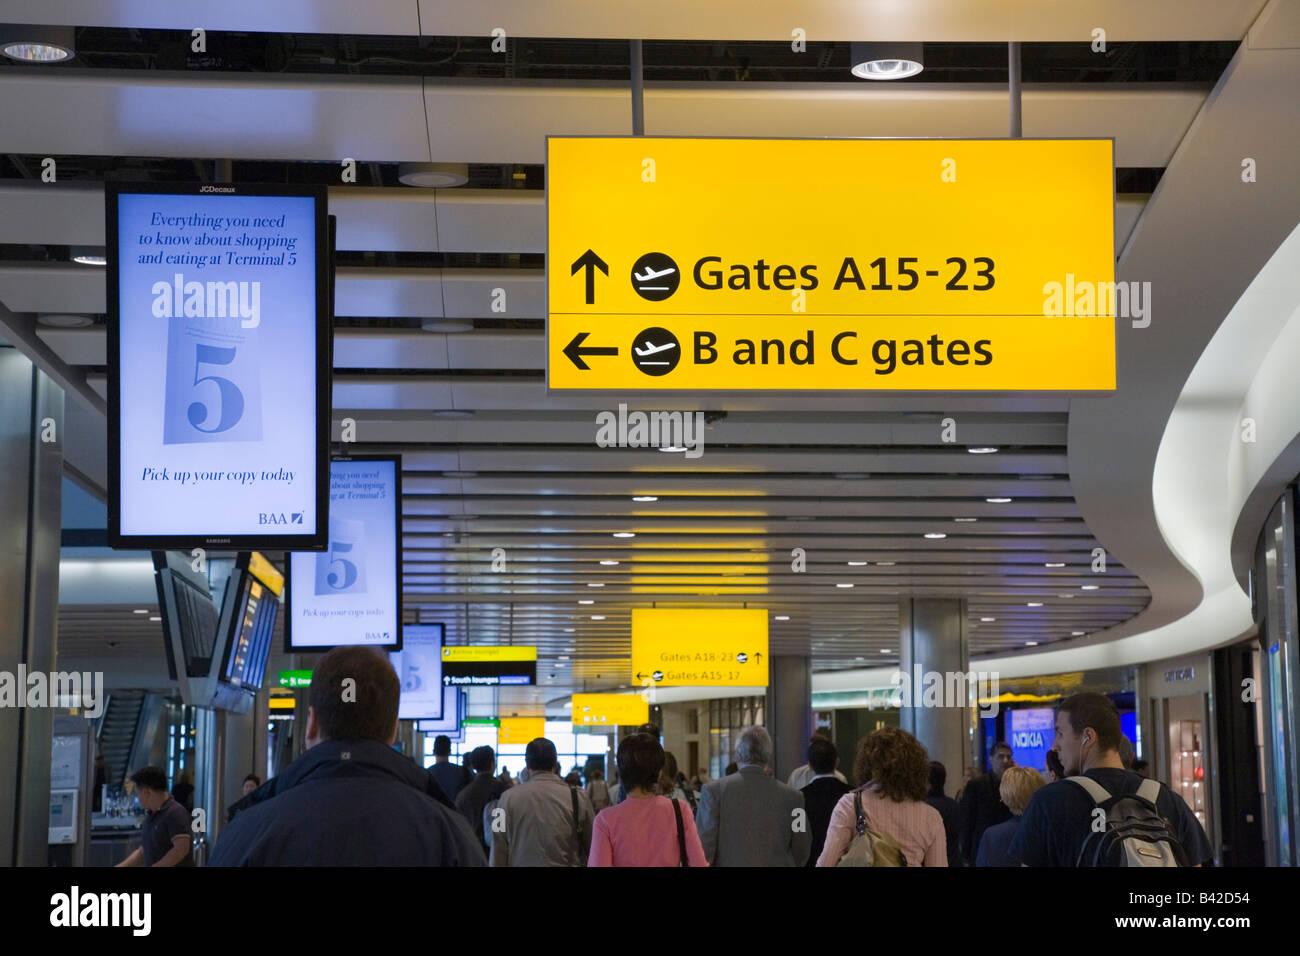 Heathrow Greater London England UK Heathrow Airport International Departures lounge in British Airways Terminal - Stock Image